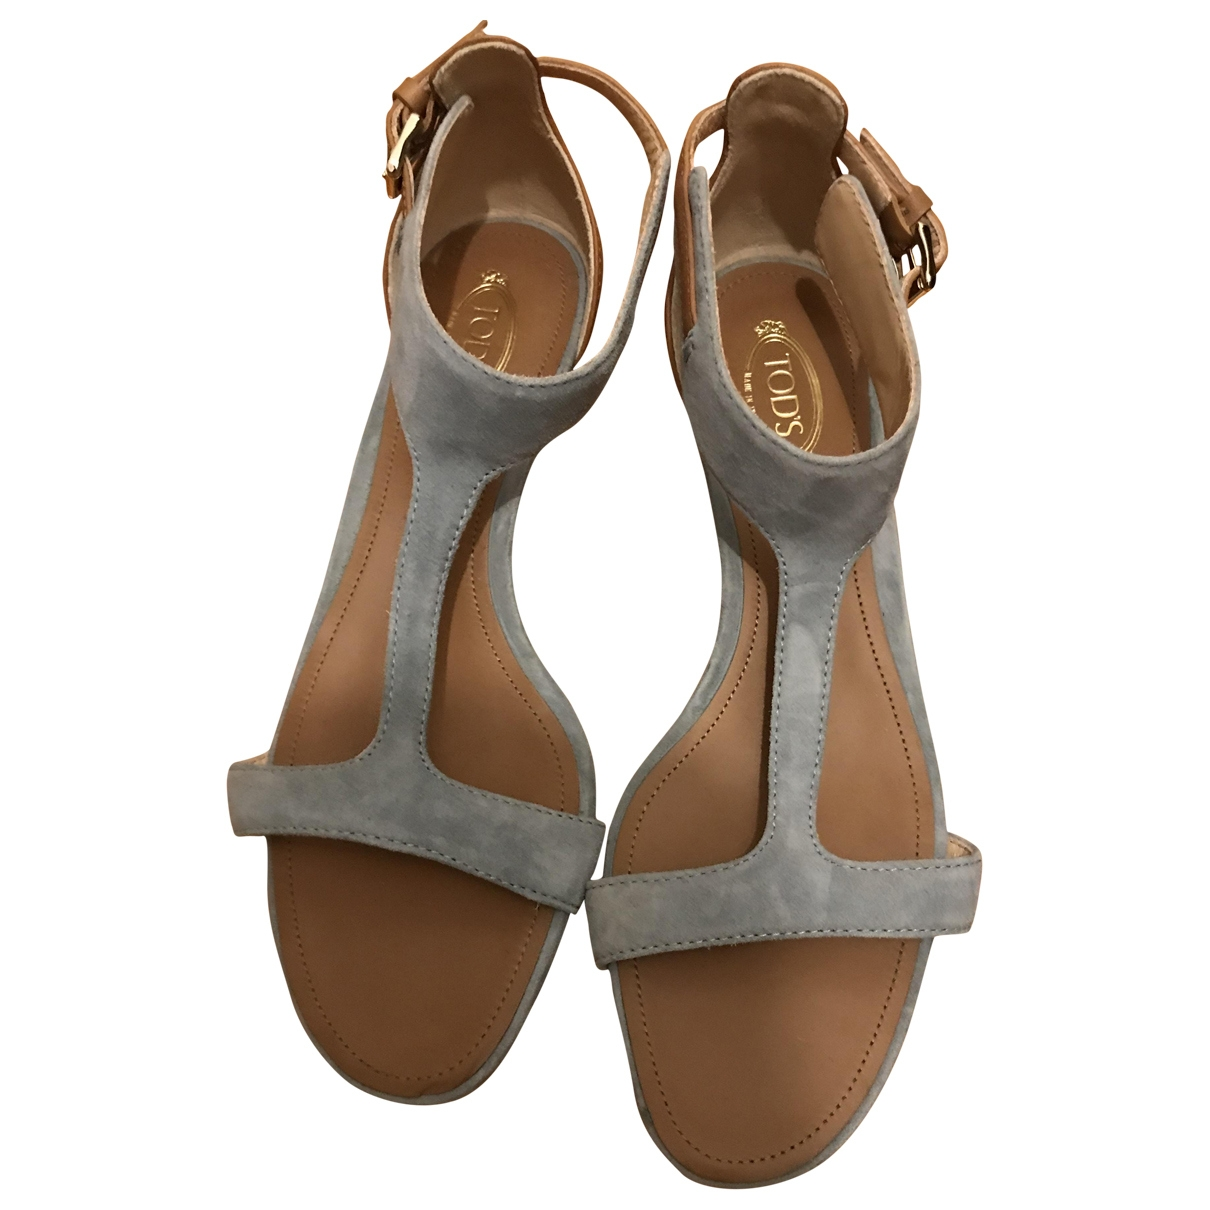 Tod's \N Multicolour Leather Sandals for Women 38 EU